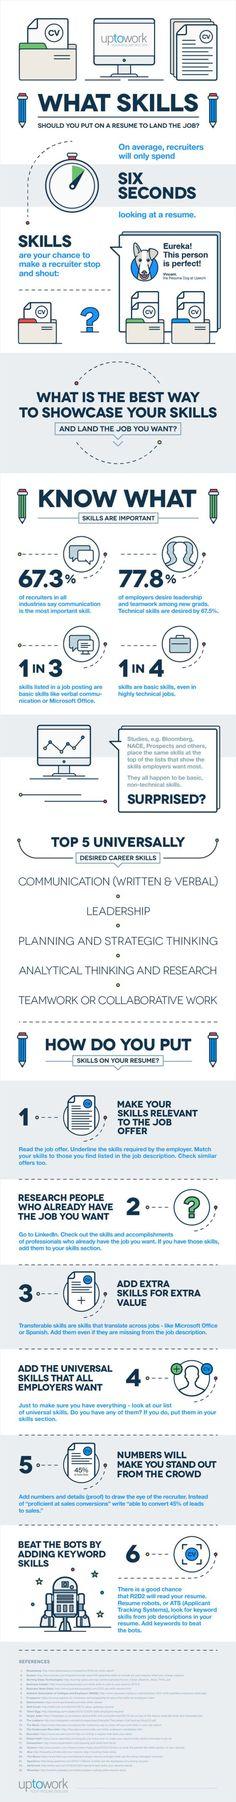 infographic  infographic  infographic  Recruiting new employees - 9 resume mistakes to avoid